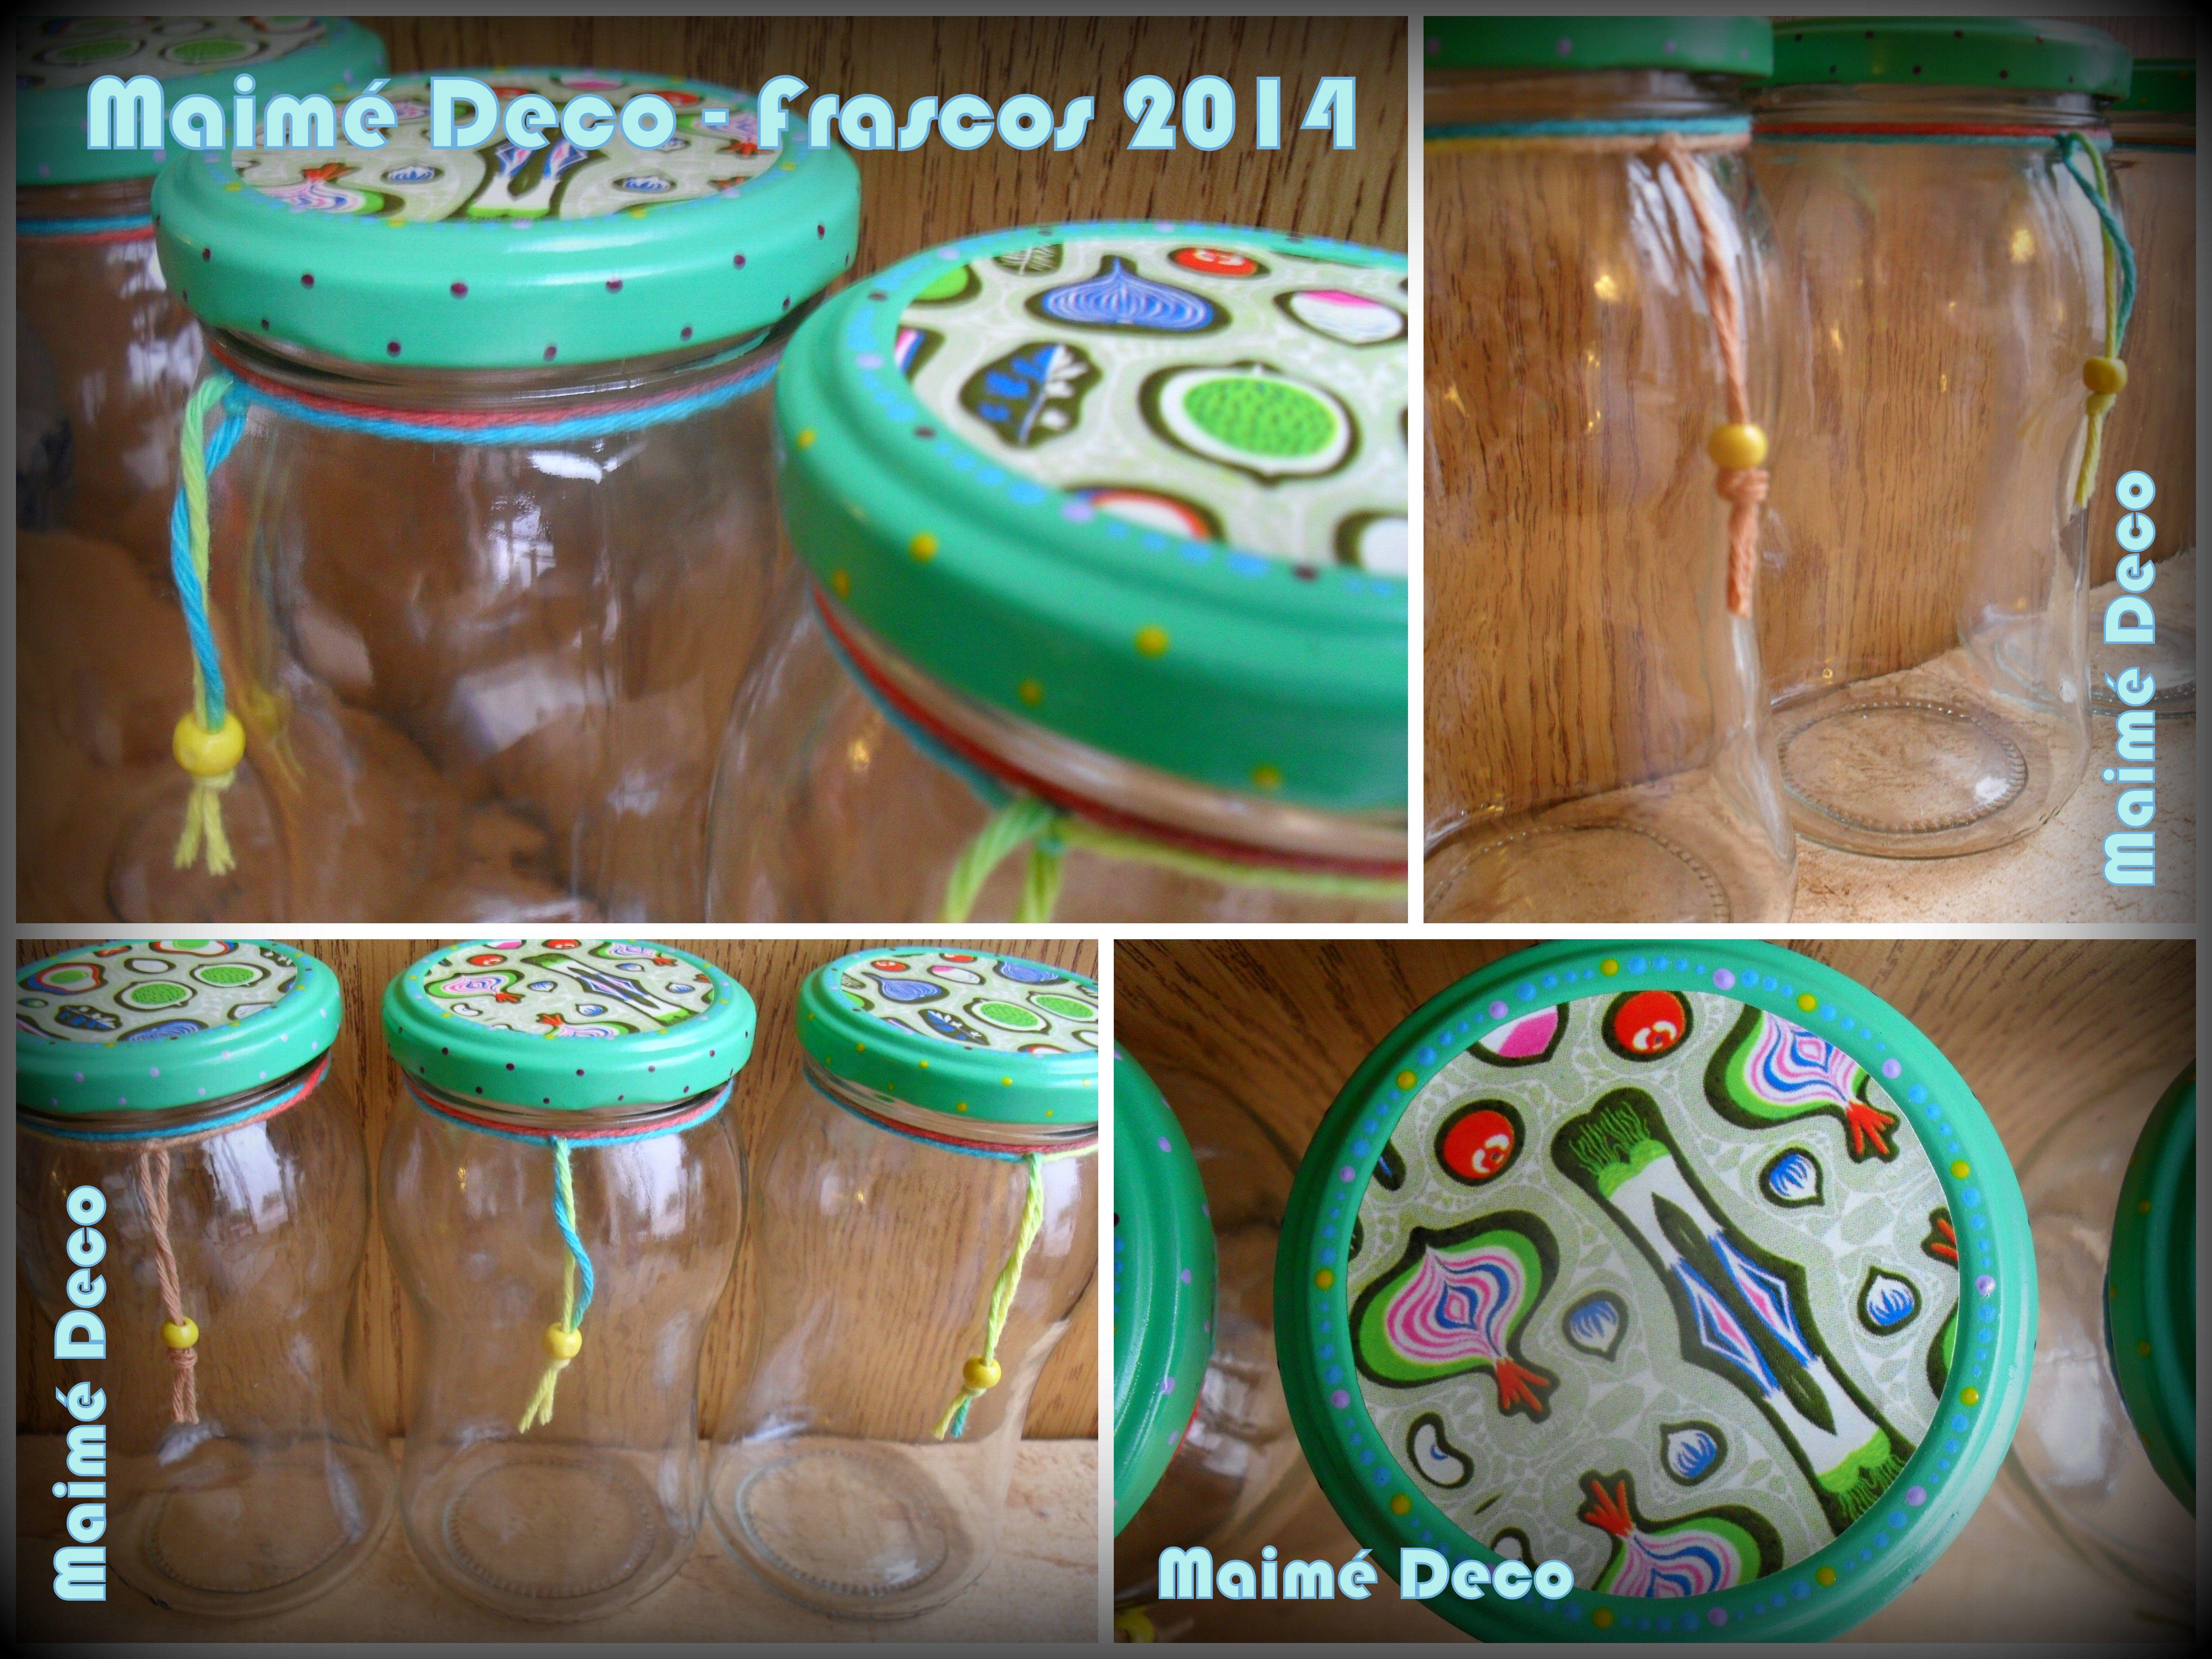 Maim deco juegos de frascos de mermelada reutilizados y - Diy frascos decorados ...